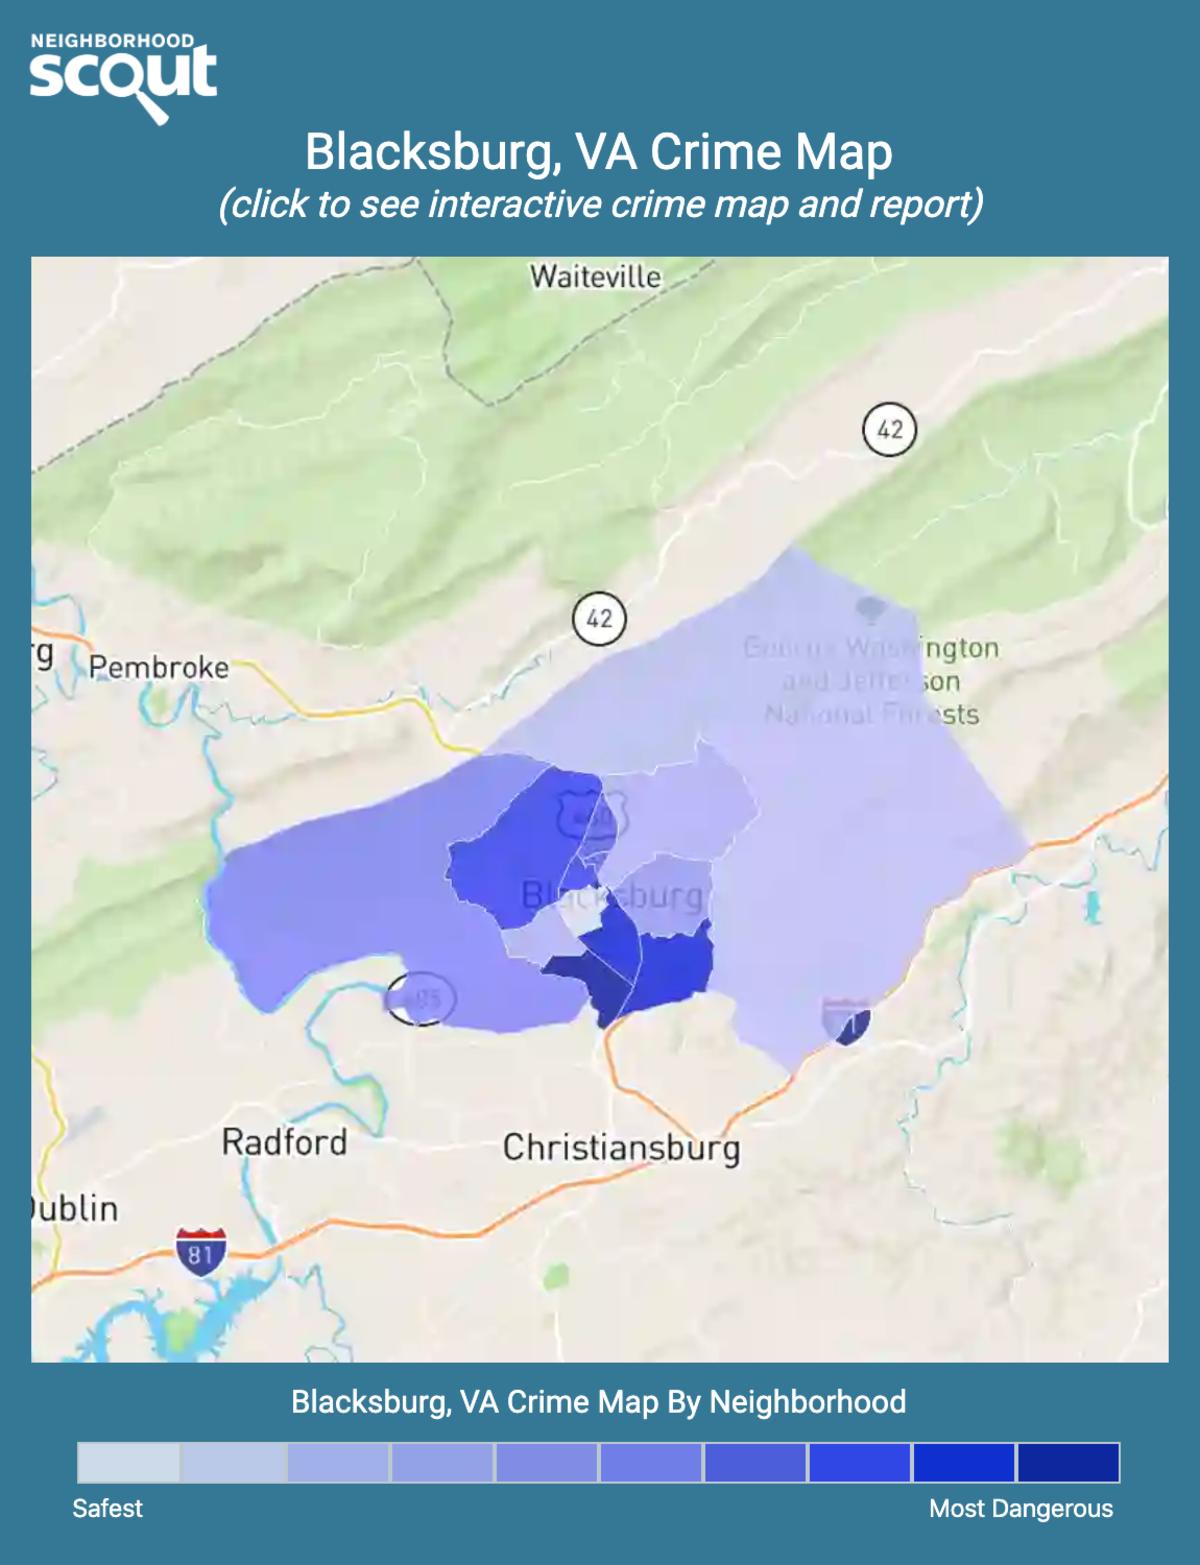 Blacksburg, Virginia crime map